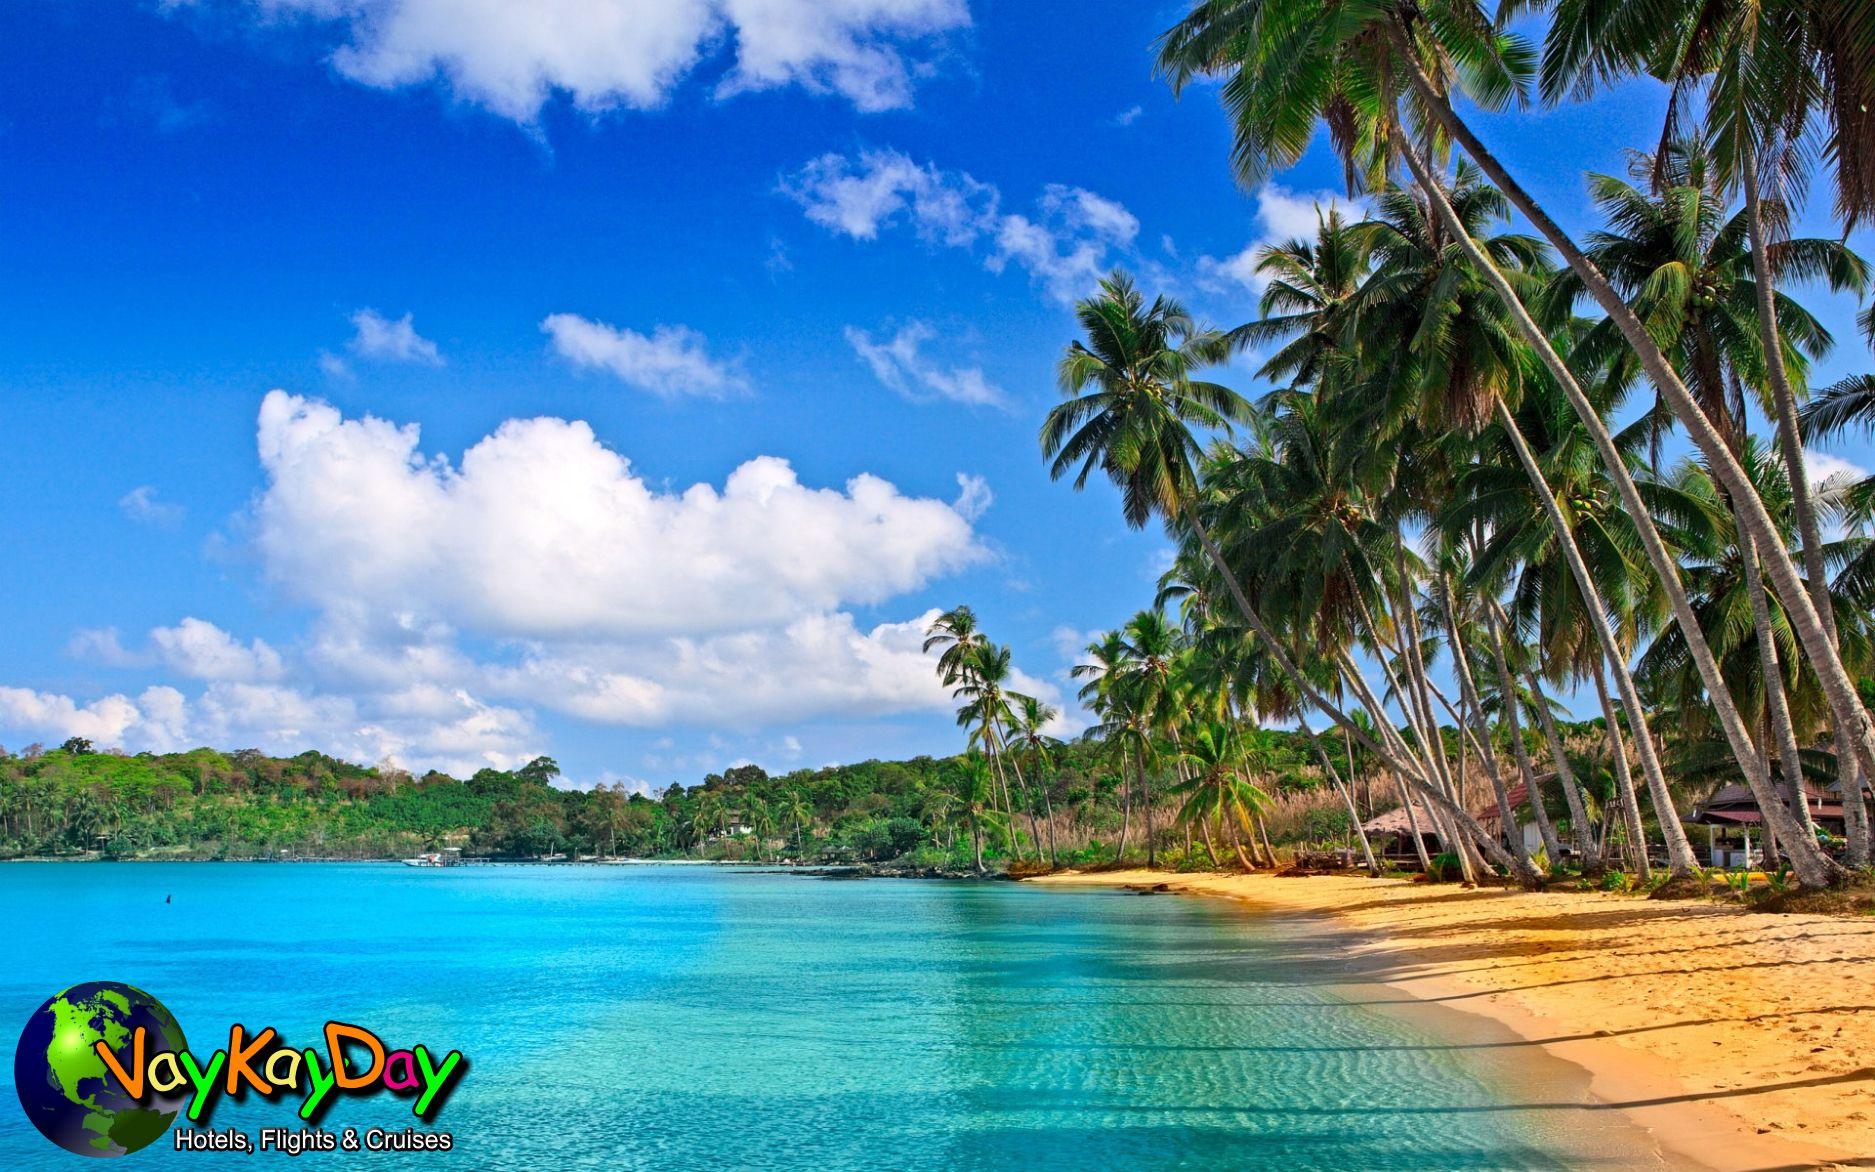 #Travel #tropical #tropicalvacation #dreamvacation #photos #travelphotos